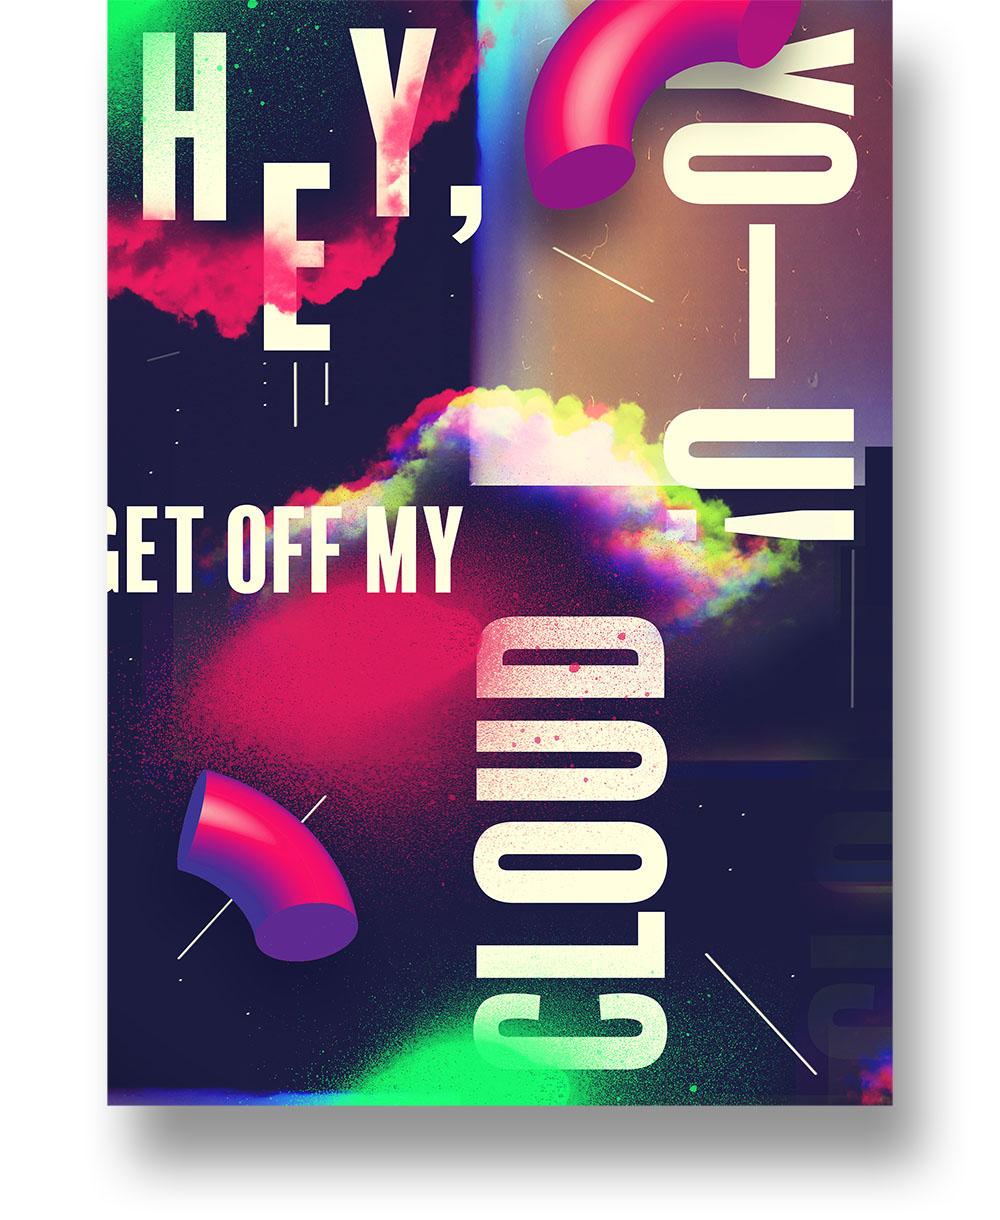 Get off my cloud - poster design